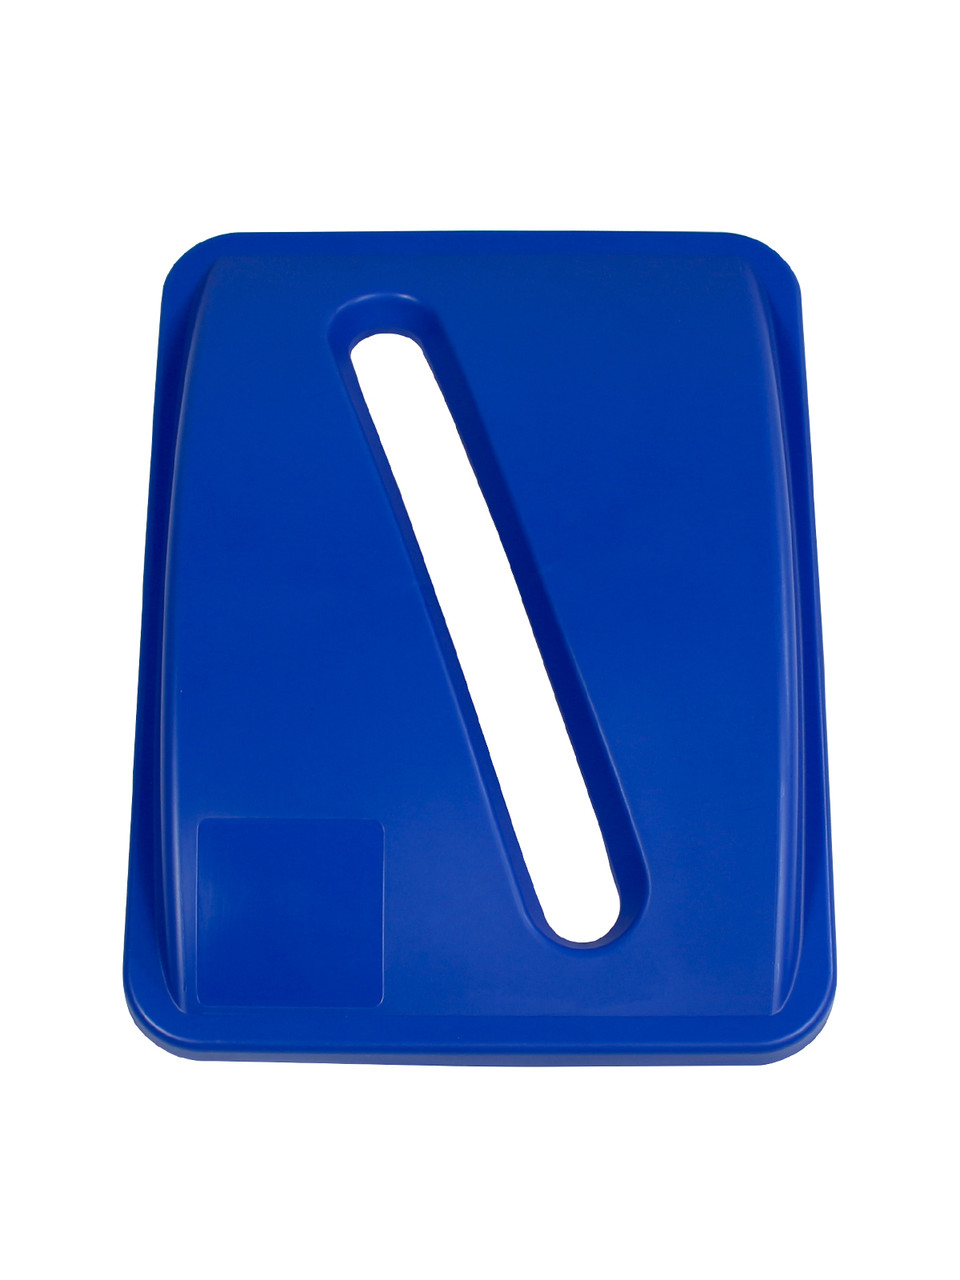 SLOT OPENING LID BLUE